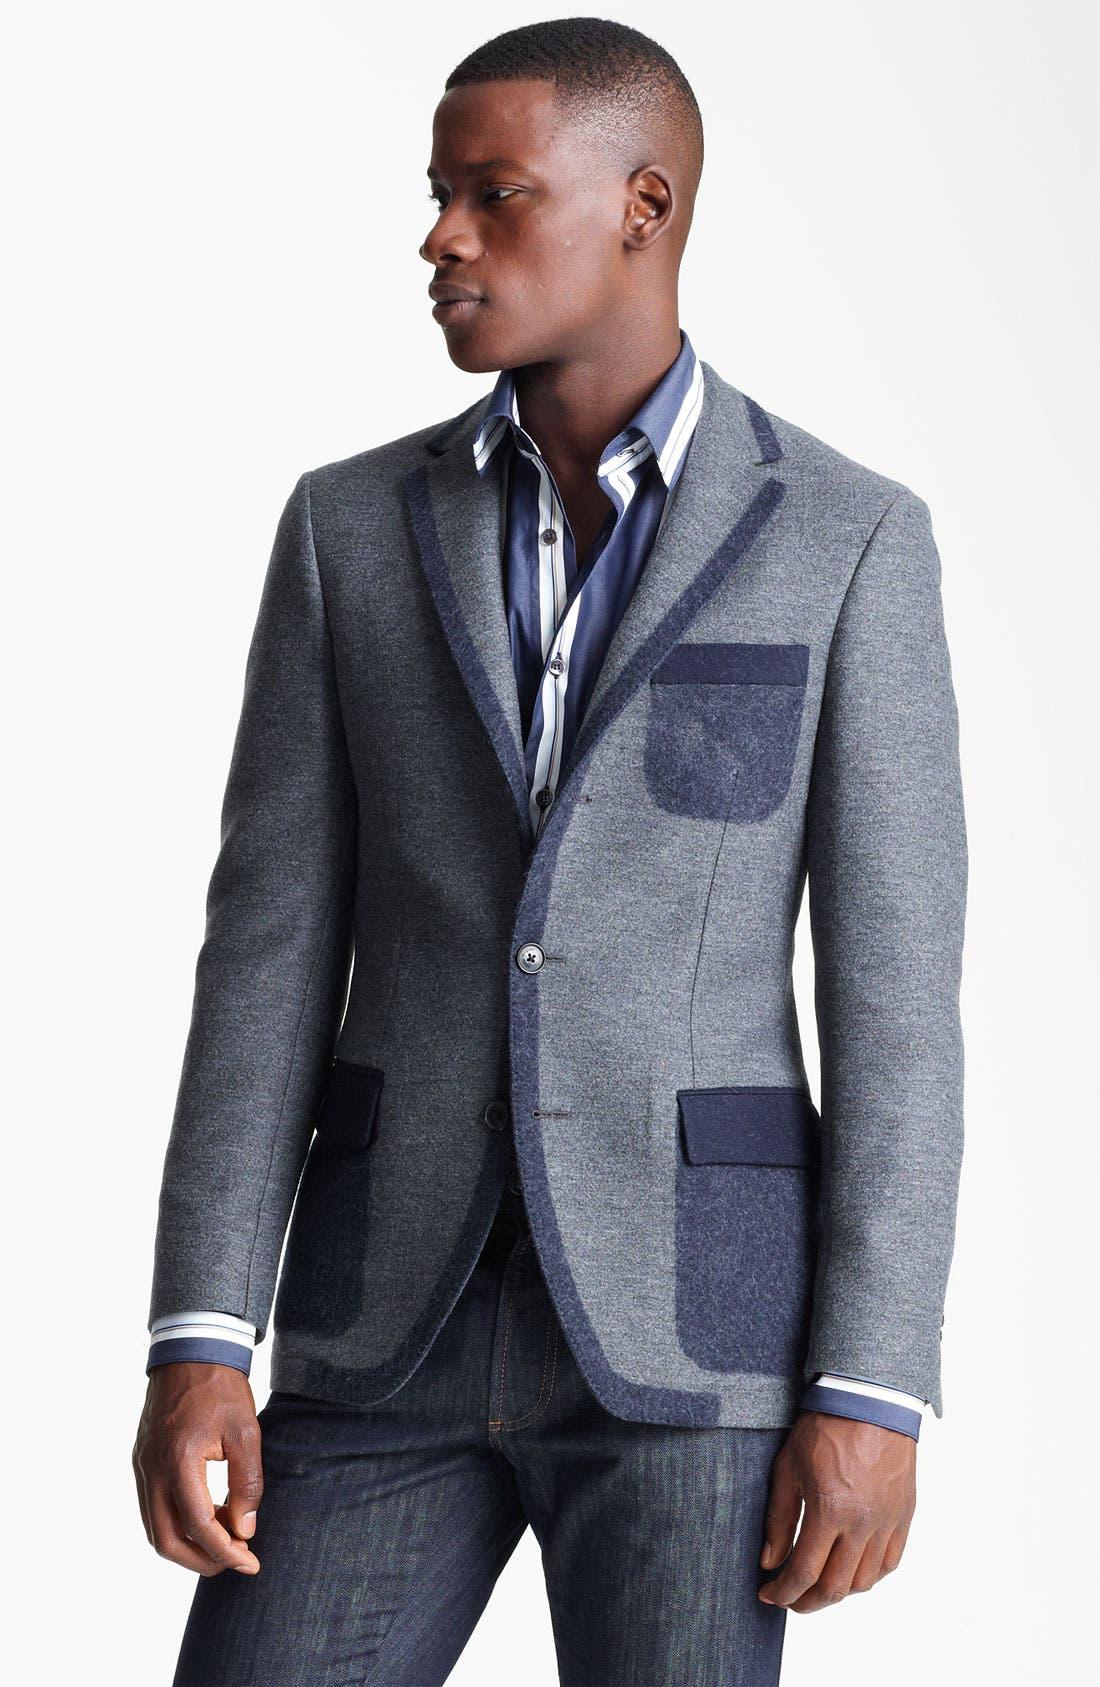 Main Image - Salvatore Ferragamo 'Giacca Monopetto' Wool Blend Sportcoat